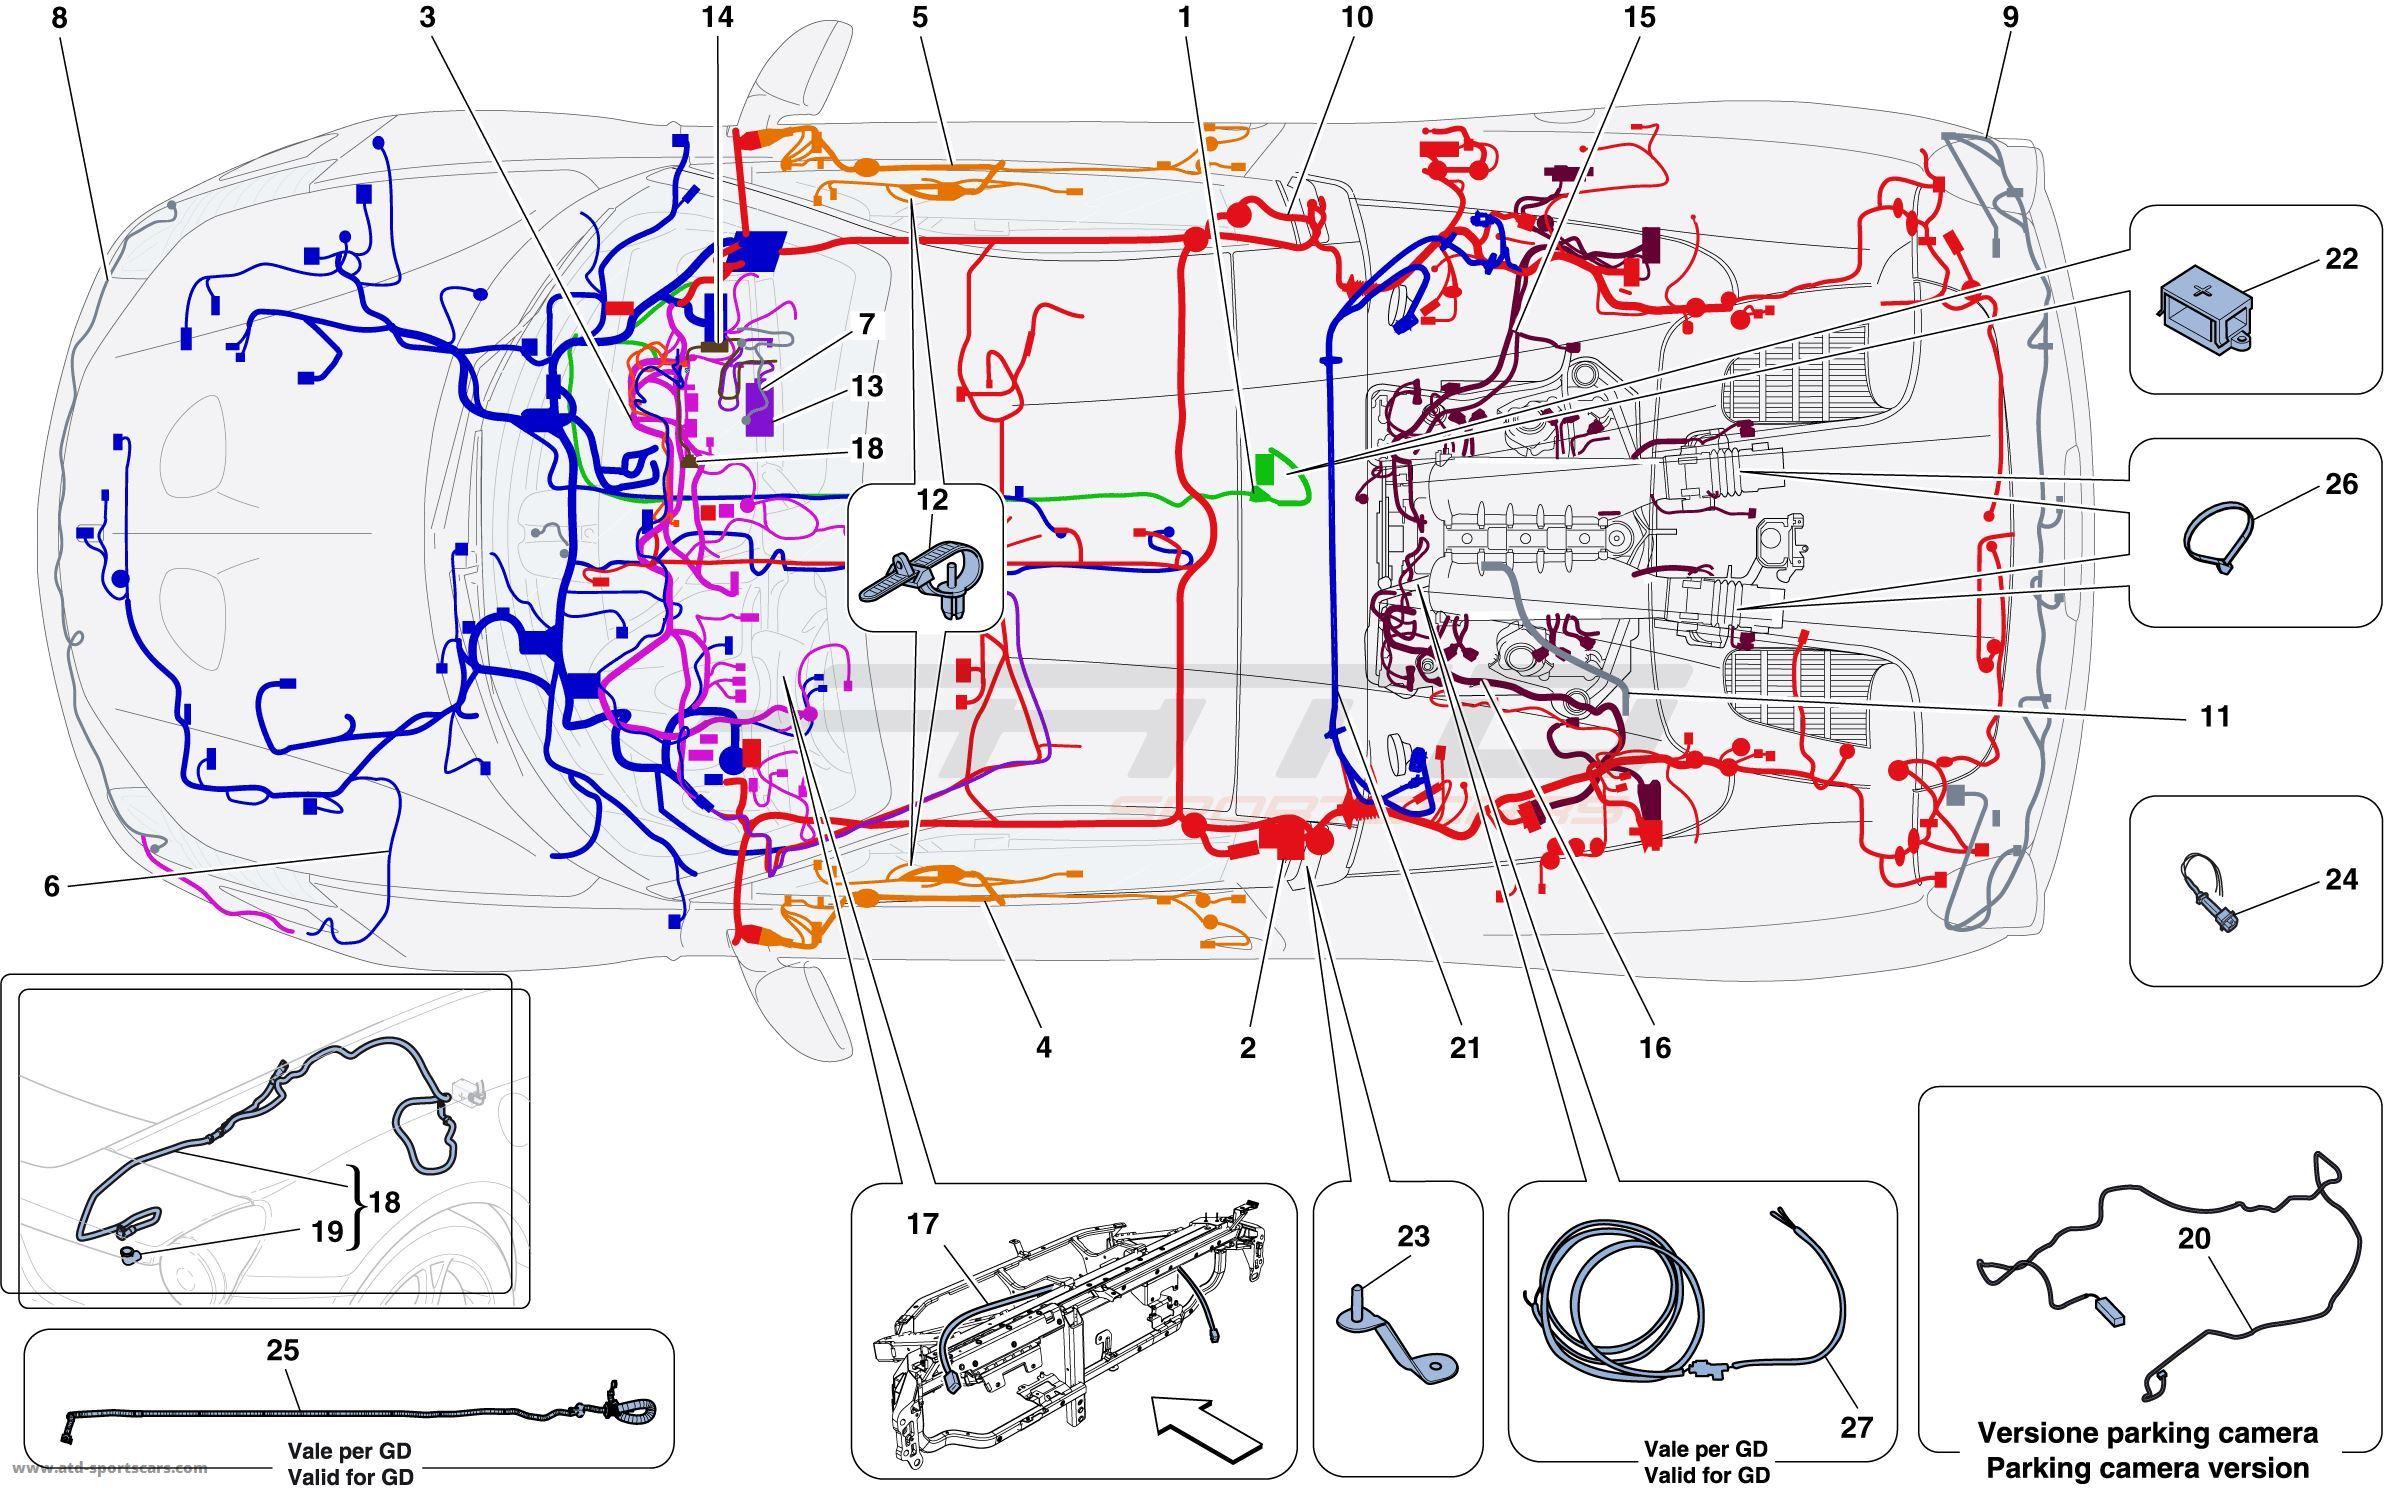 Wondrous Ferrari 458 Speciale A Main Wiring Harnesses Atd Sportscars Wiring 101 Sianudownsetwise Assnl